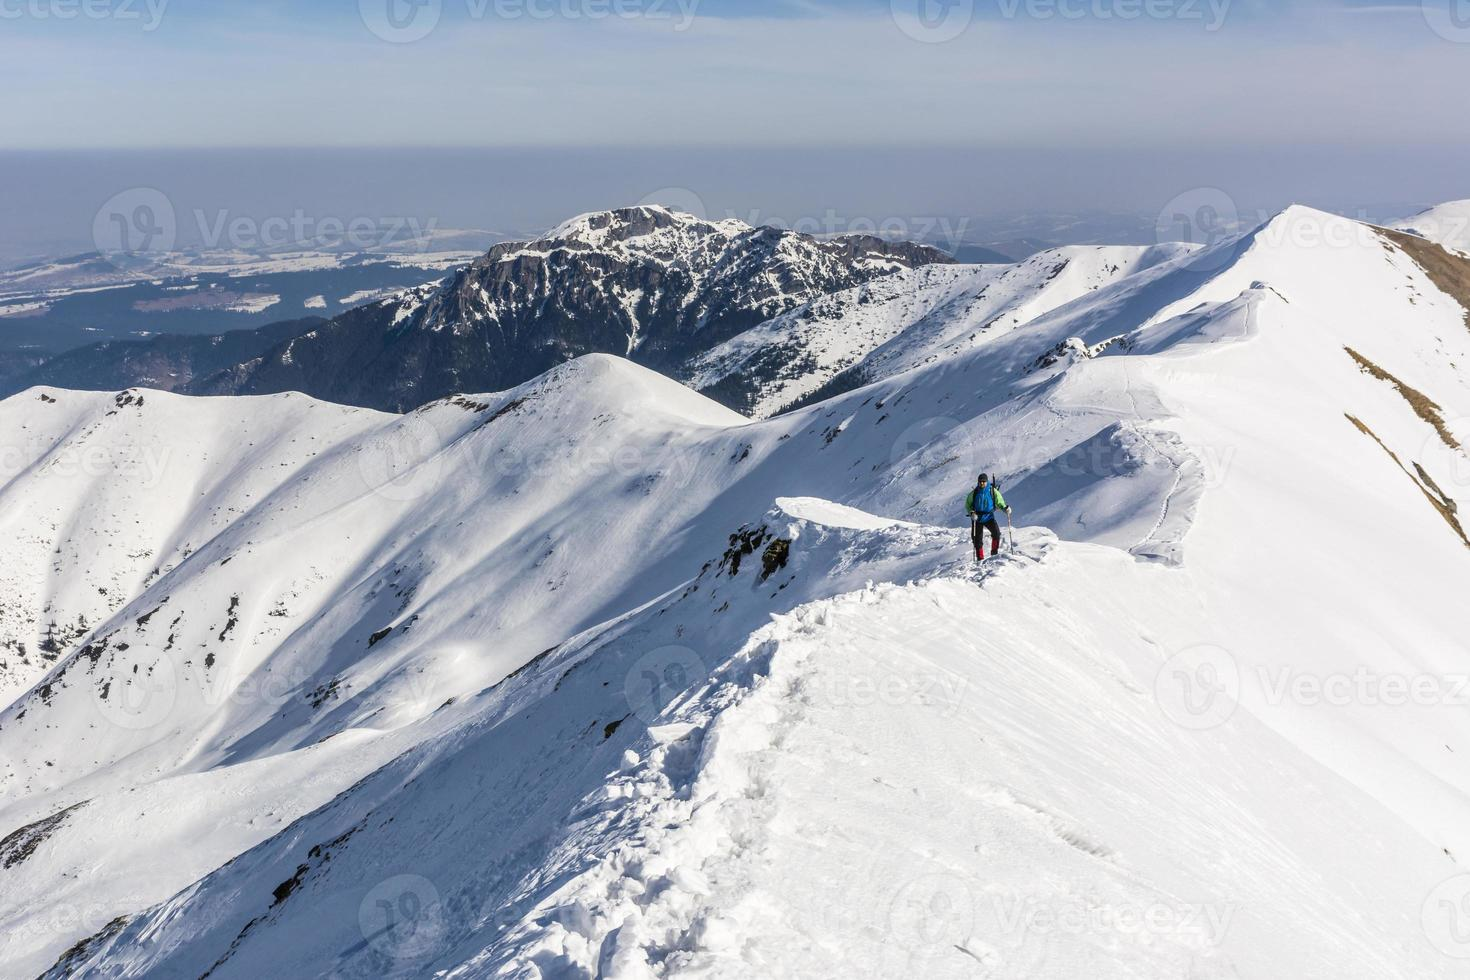 alpinista in cresta in condizioni invernali foto